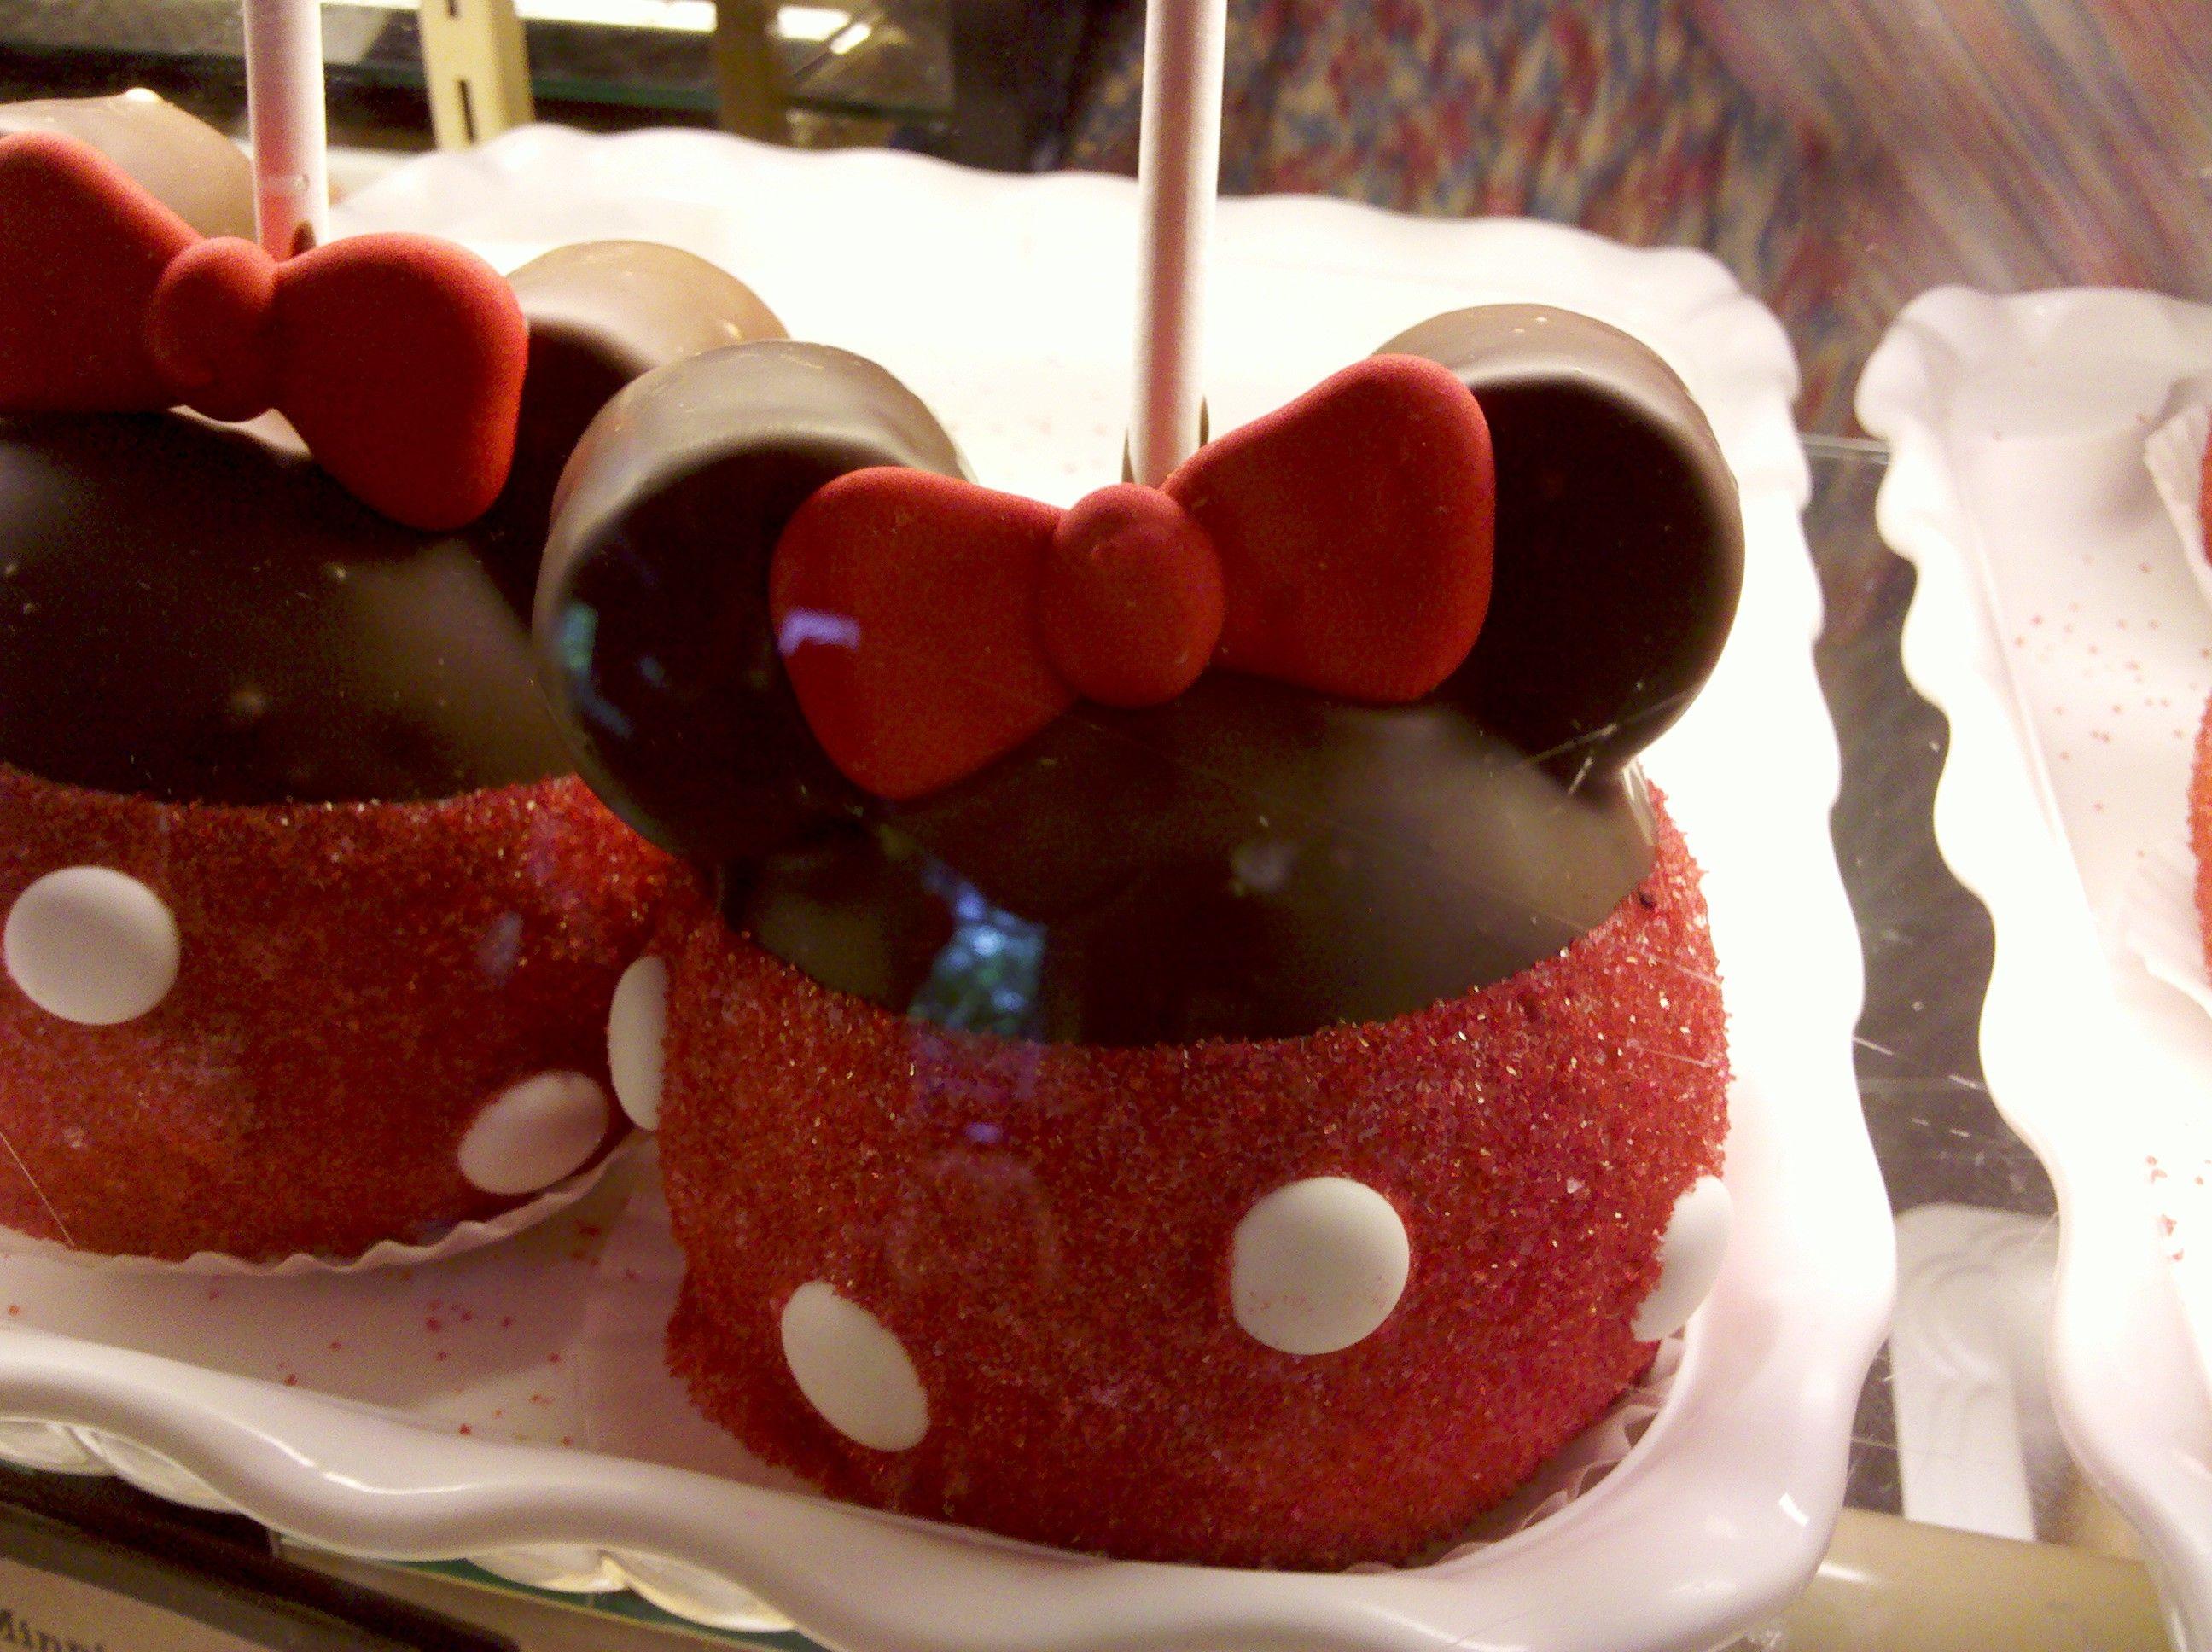 Minnie Mouse caramel apple - $9.95 at Disneyland!